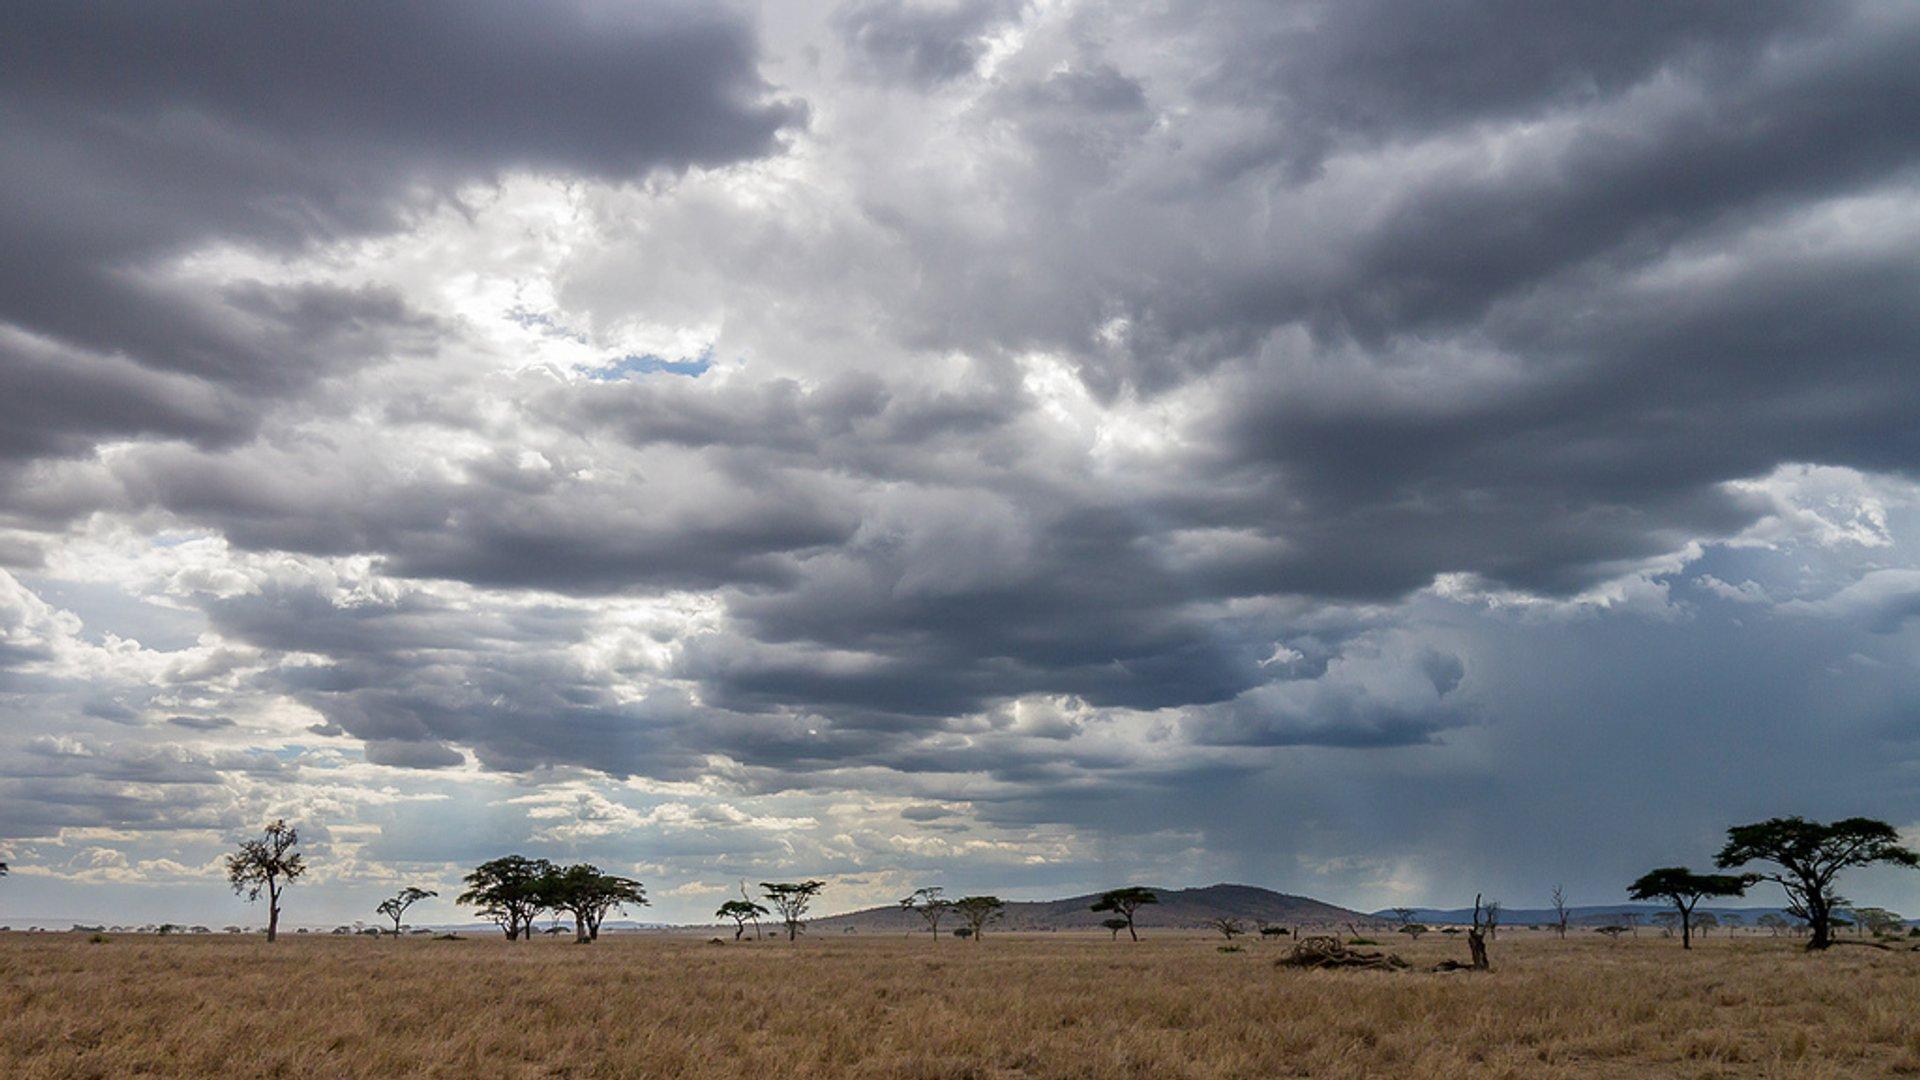 Short Rainy Season in Tanzania - Best Time